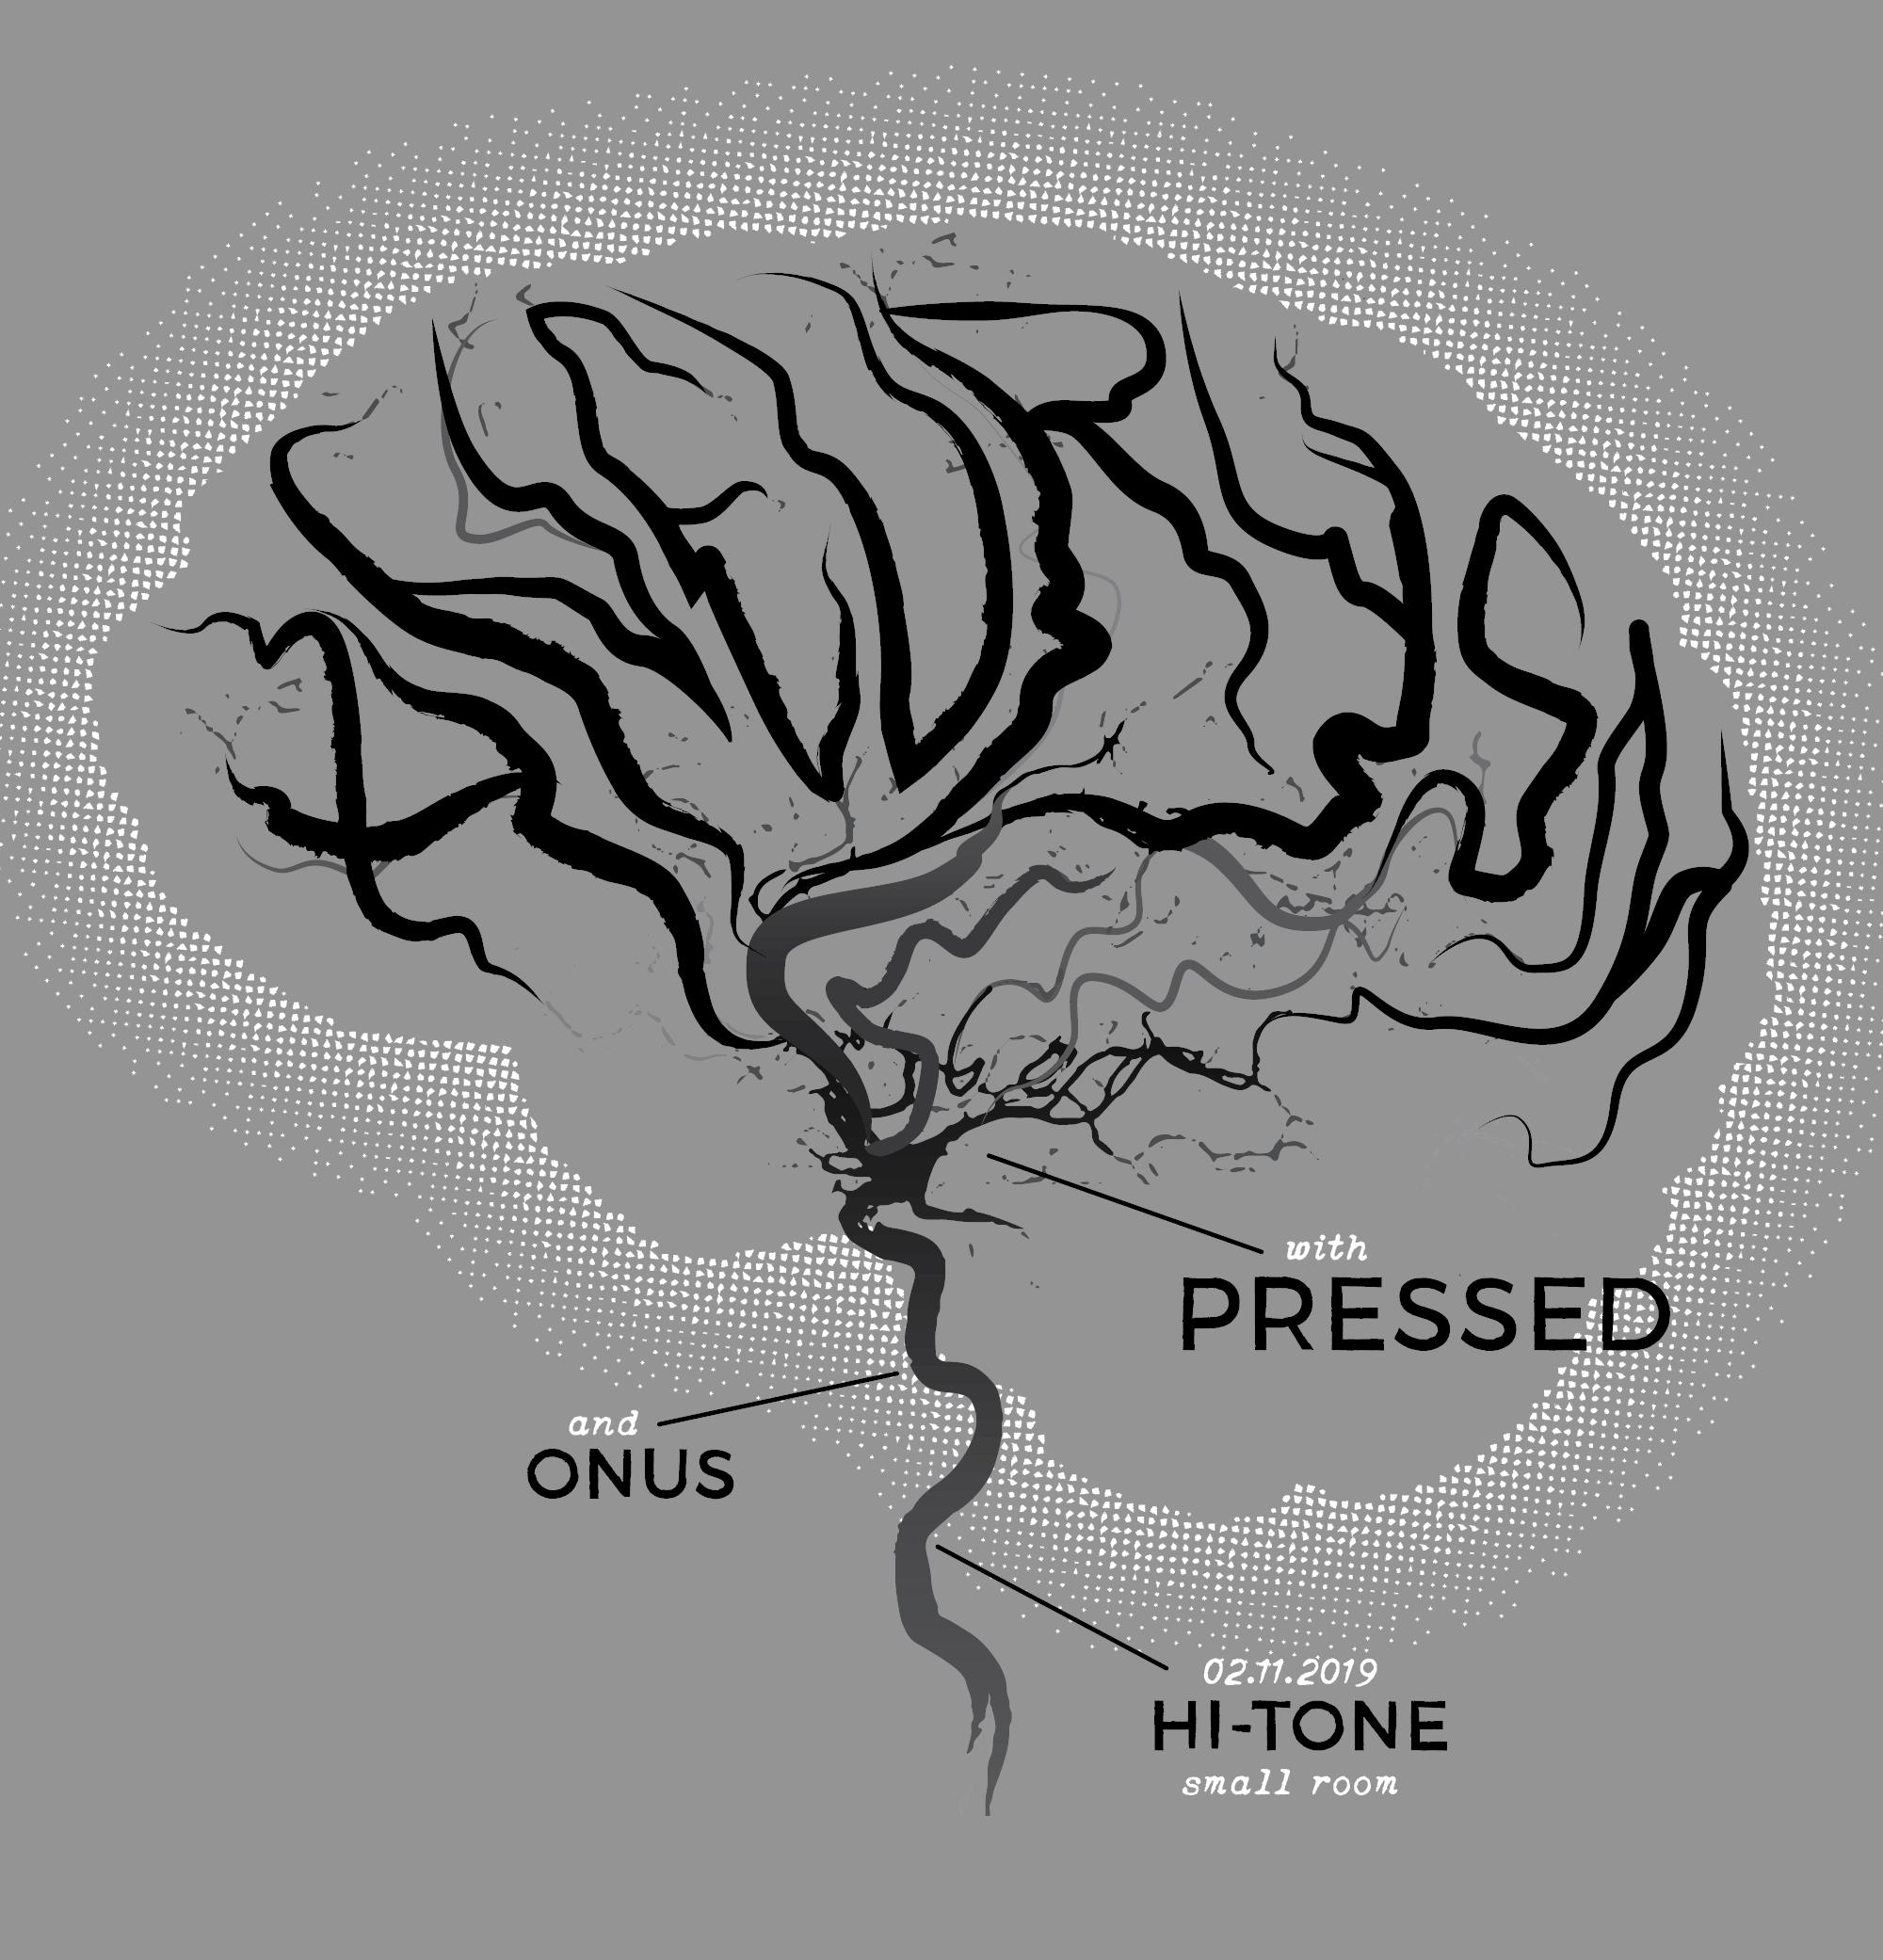 Aneurysm / Pressed / Onus